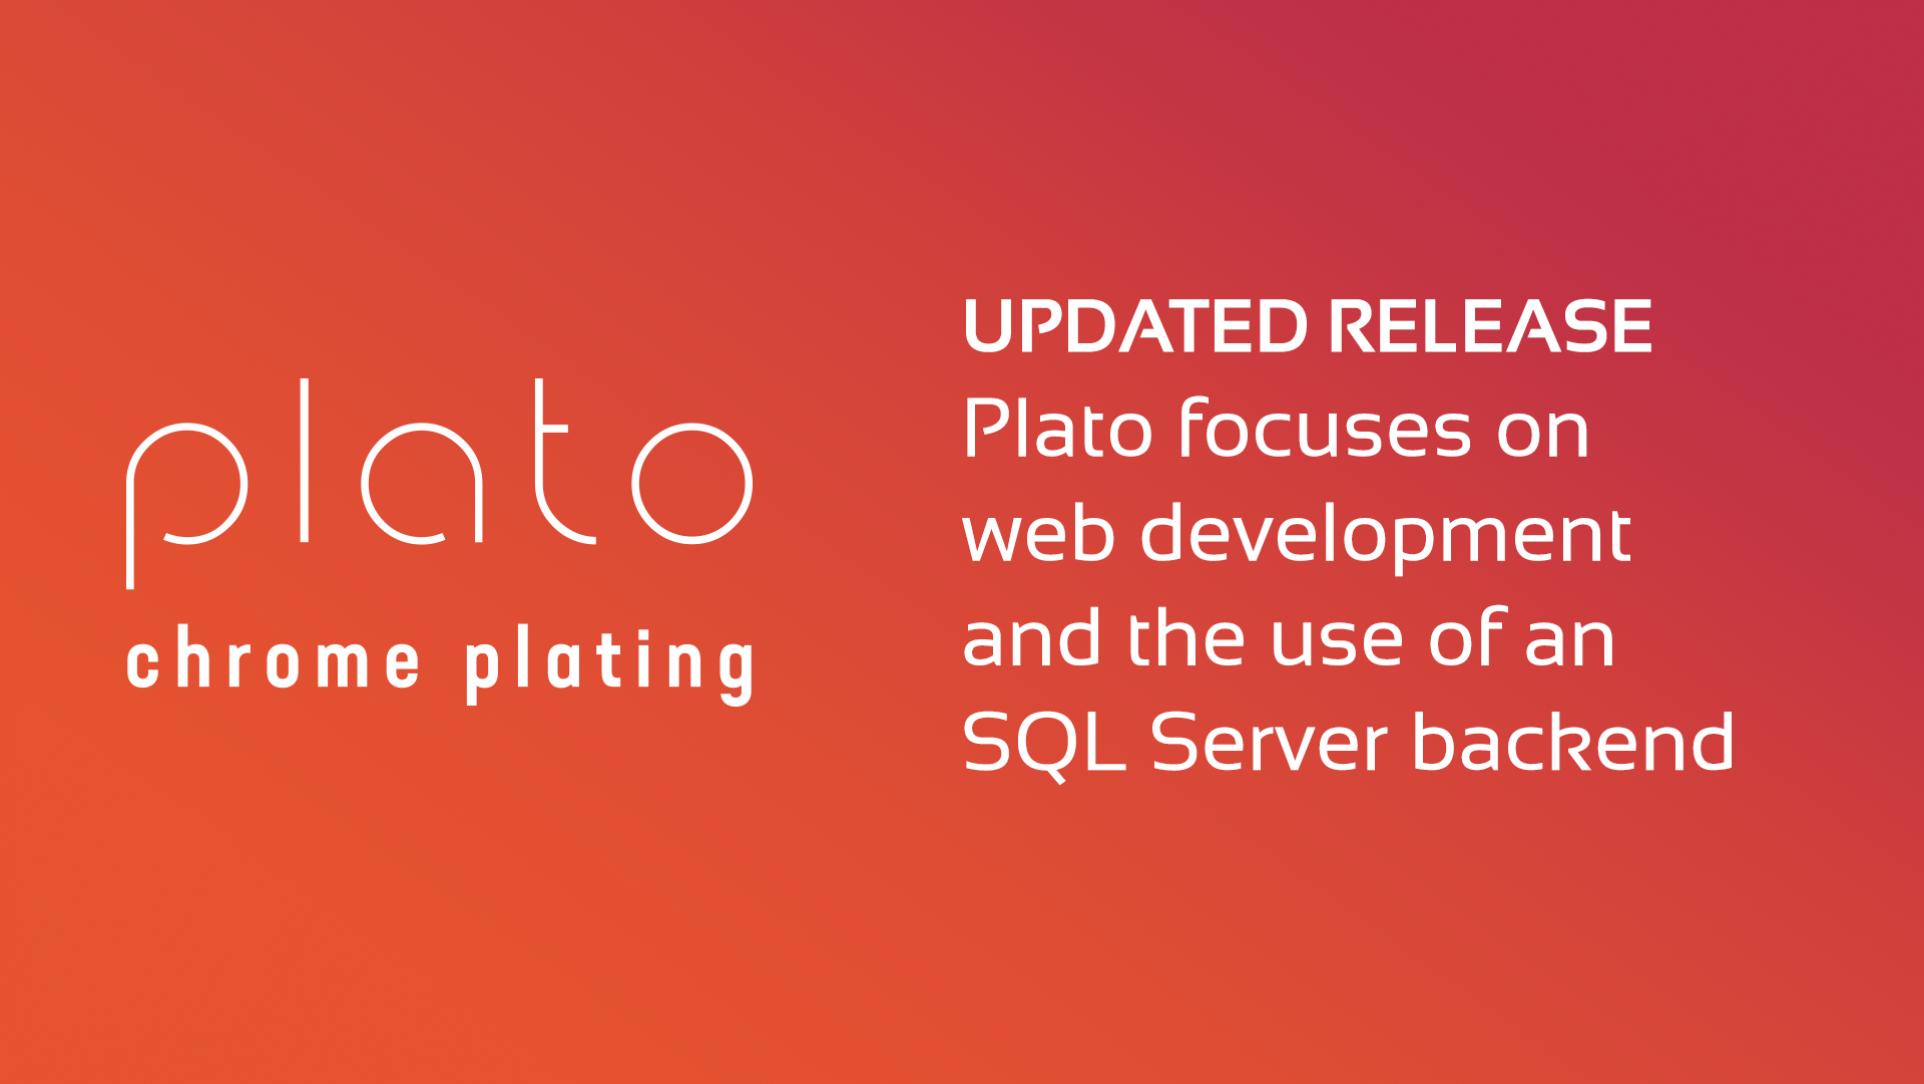 2021-04-19 Plato Updated release